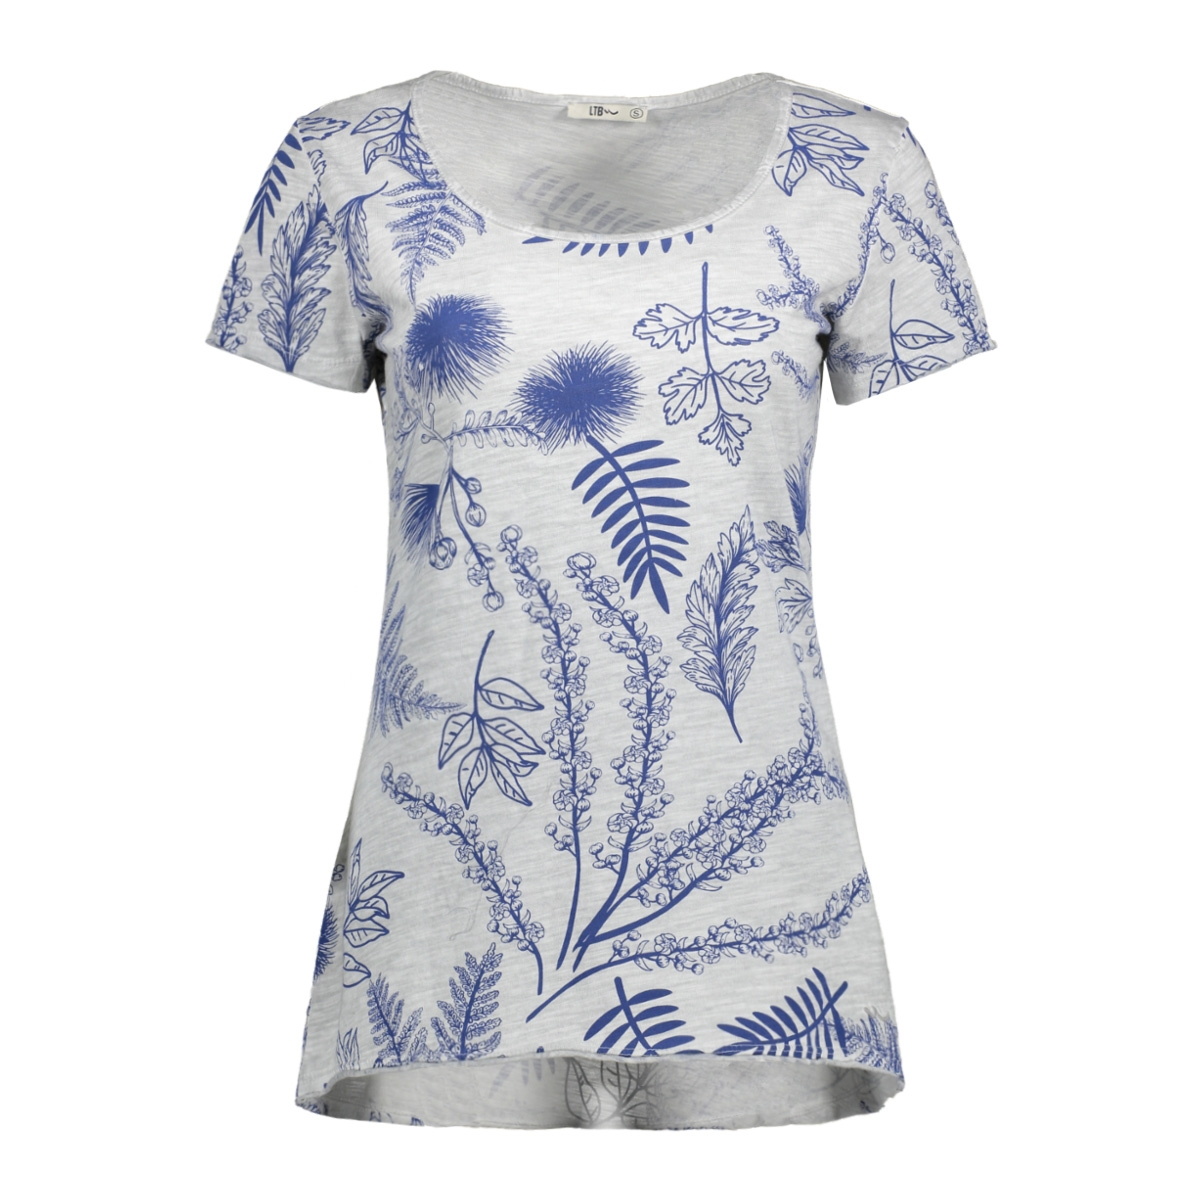 121780361.6143 ltb t-shirt greymel